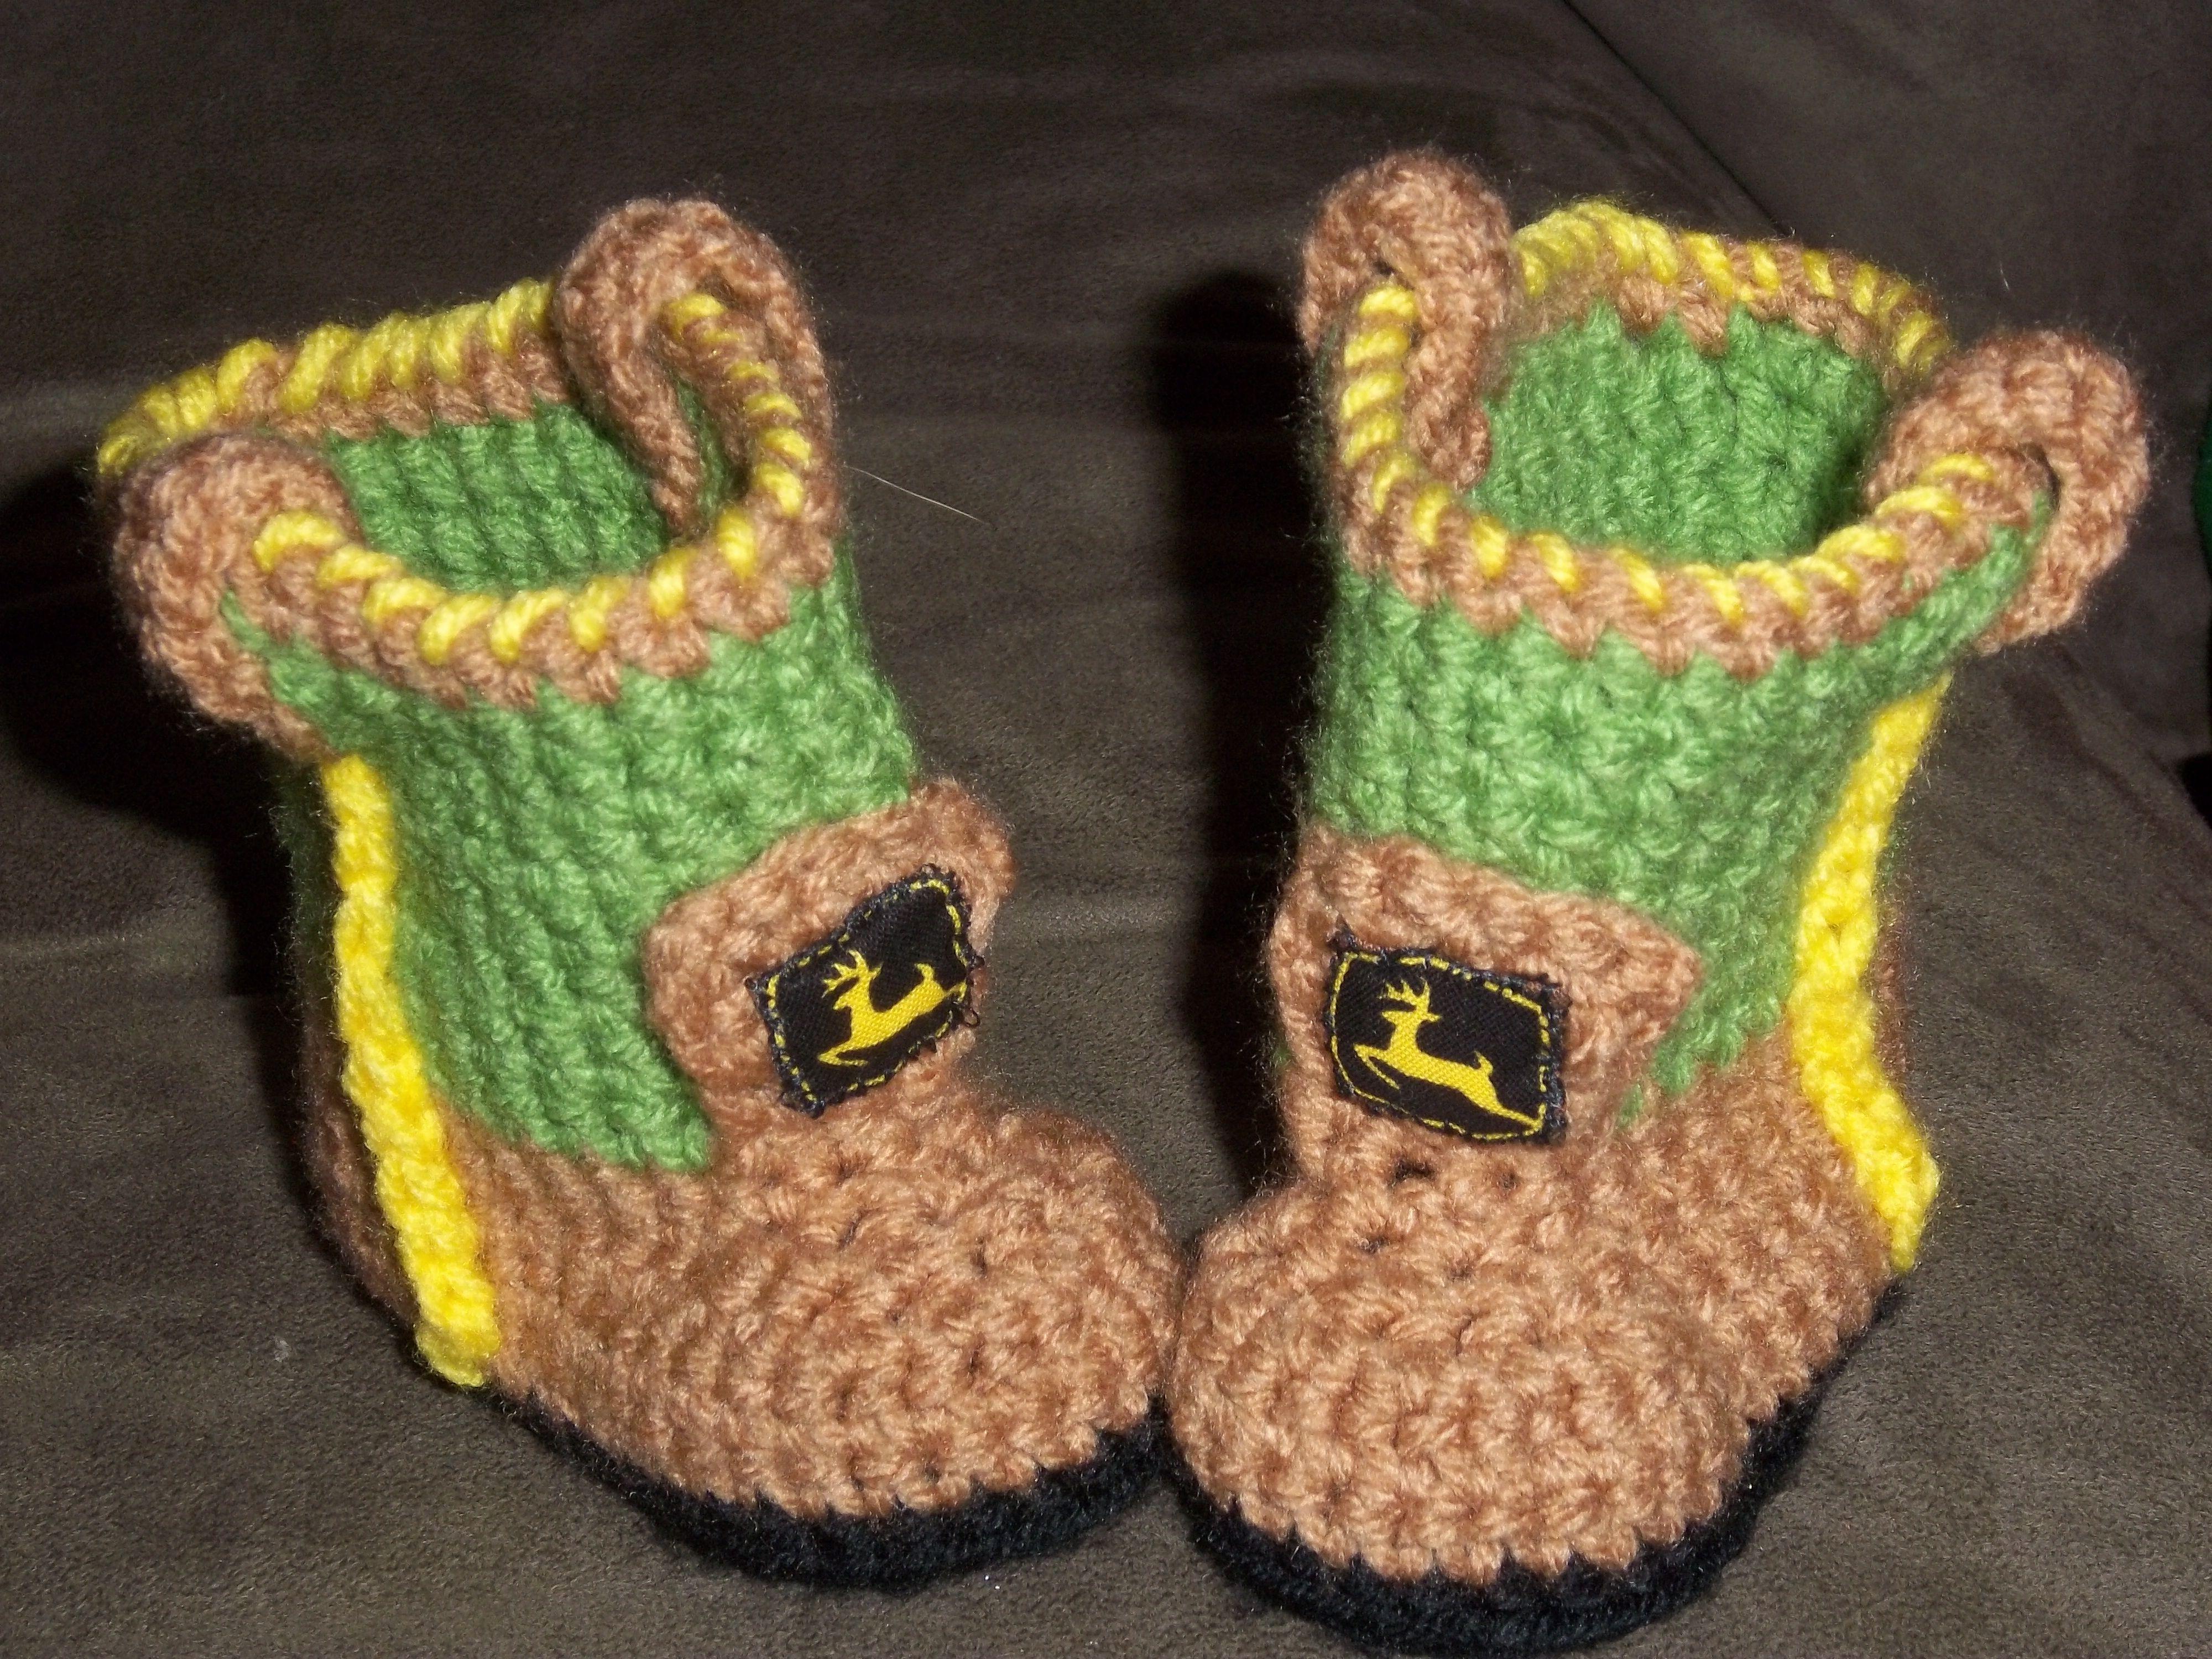 Pin on my crochet items